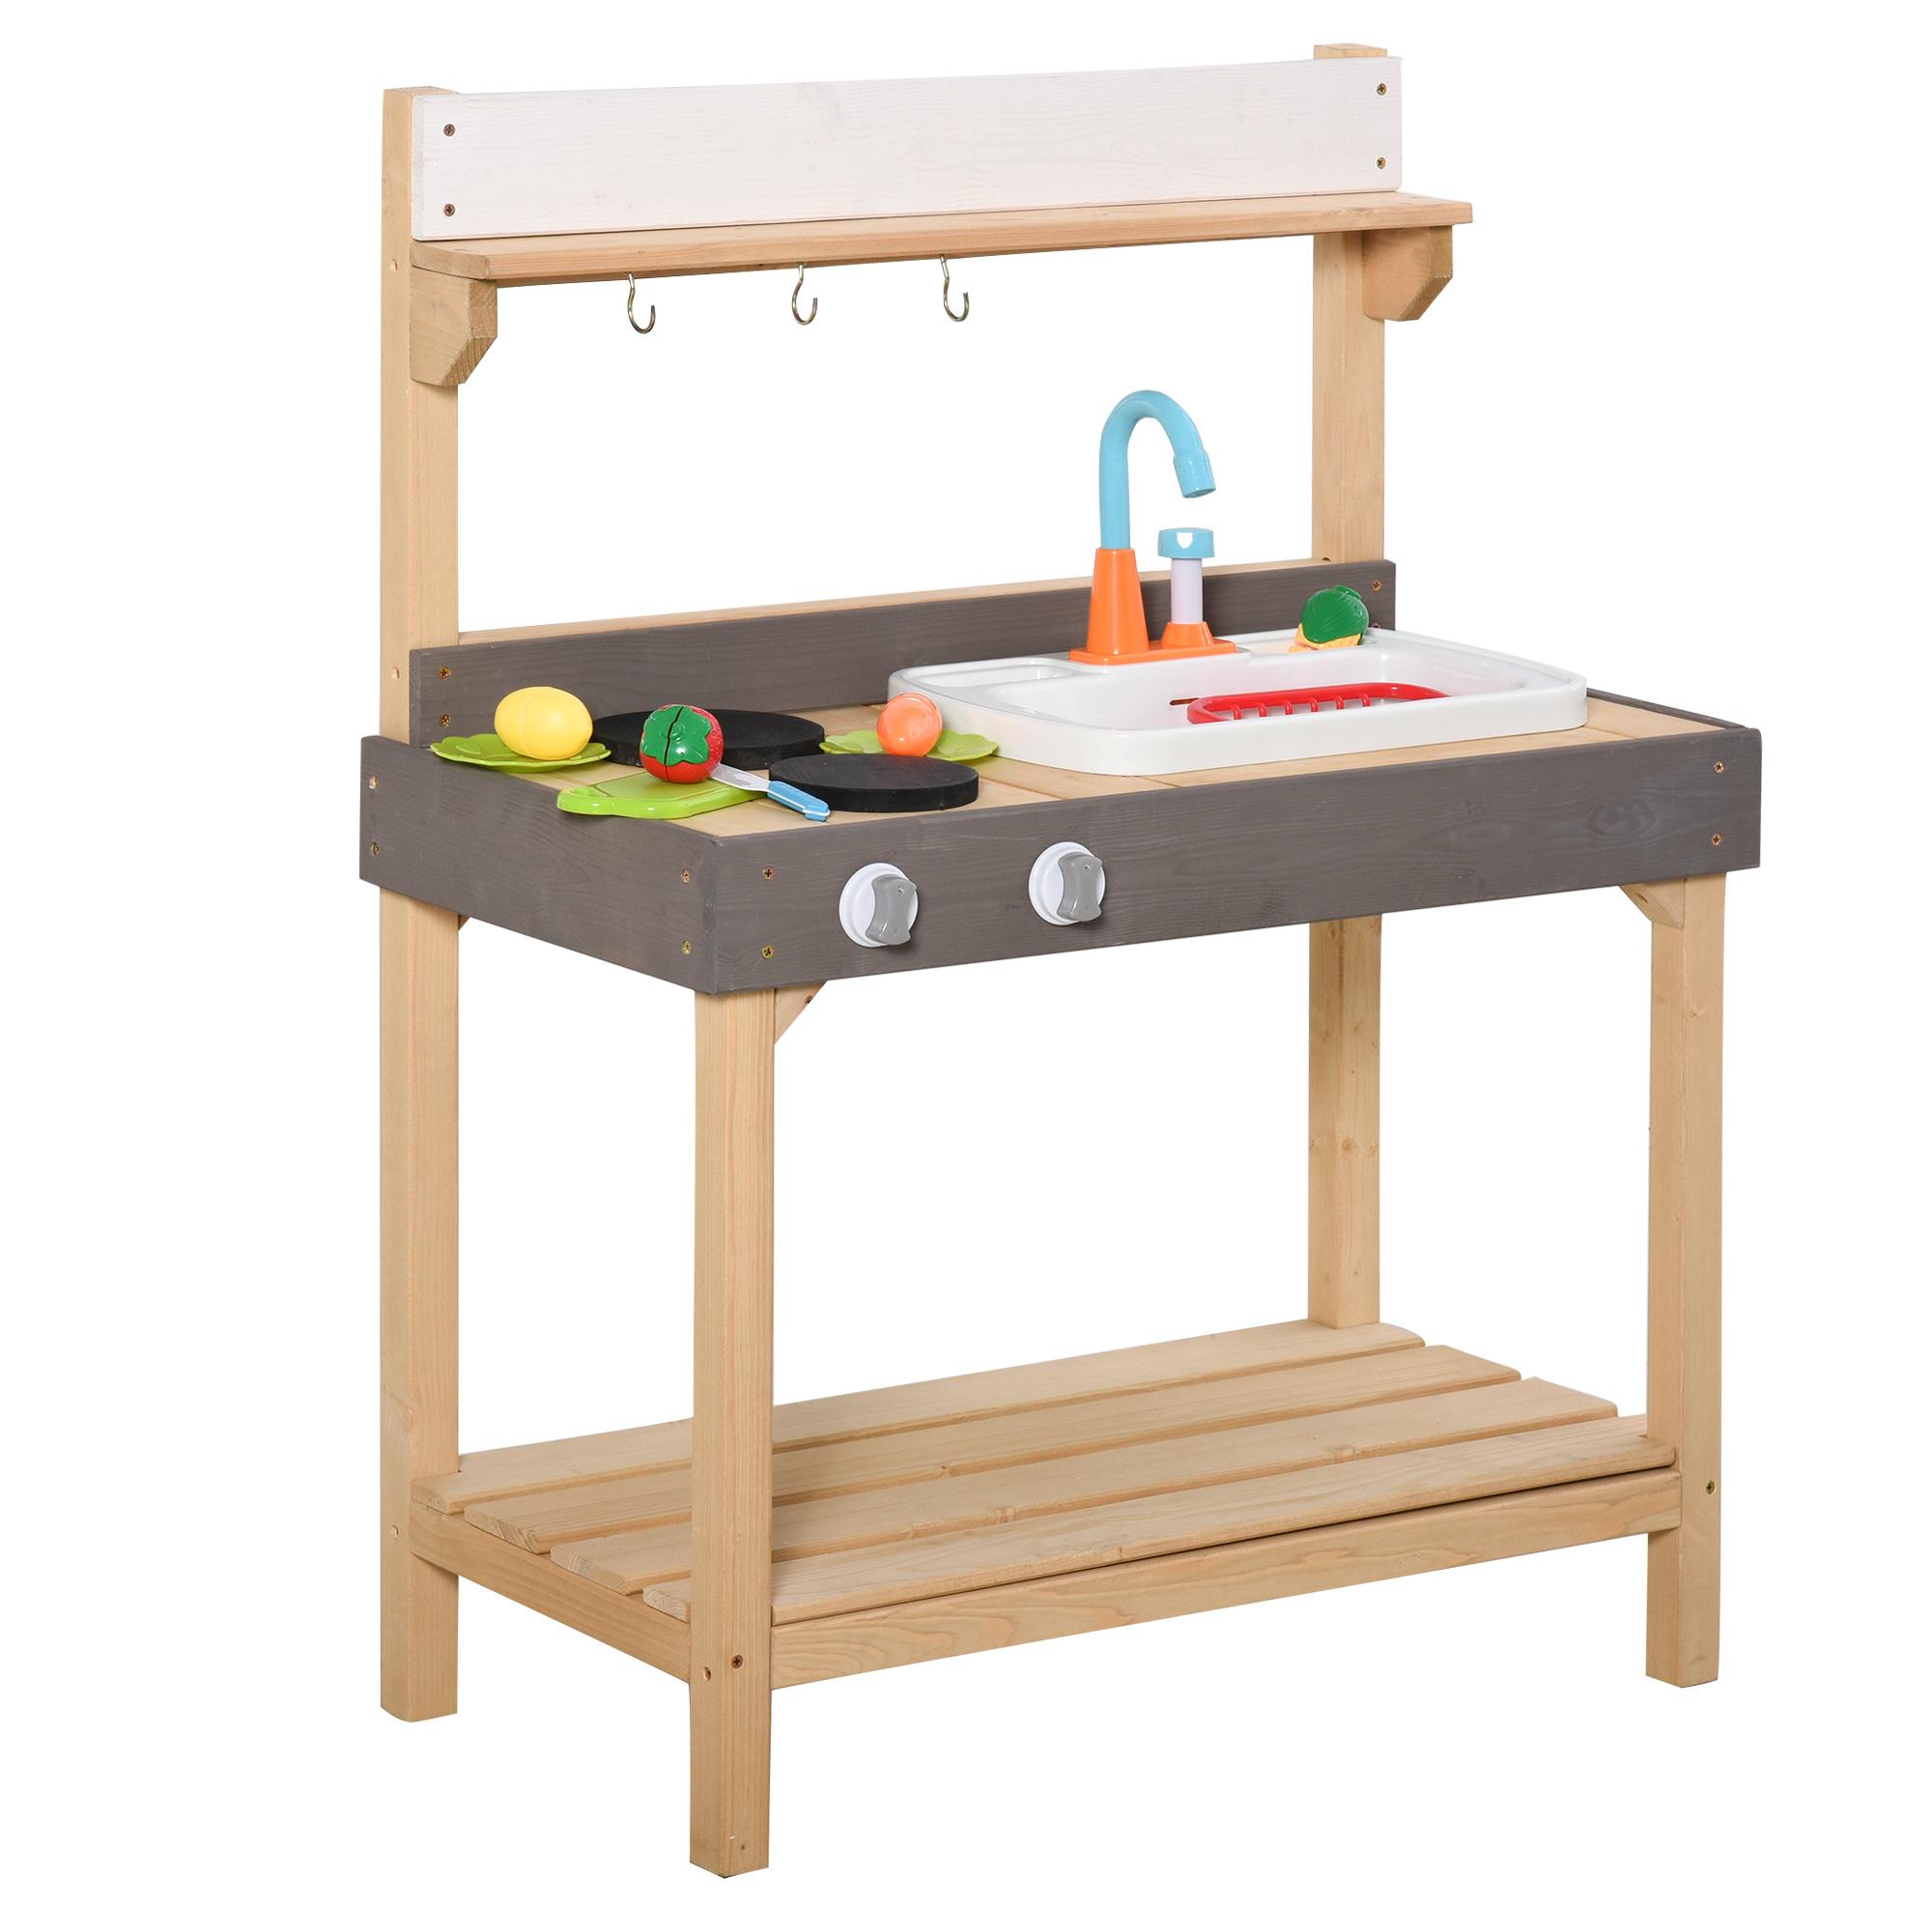 outsunny kids kitchen, best mud kitchens for kids